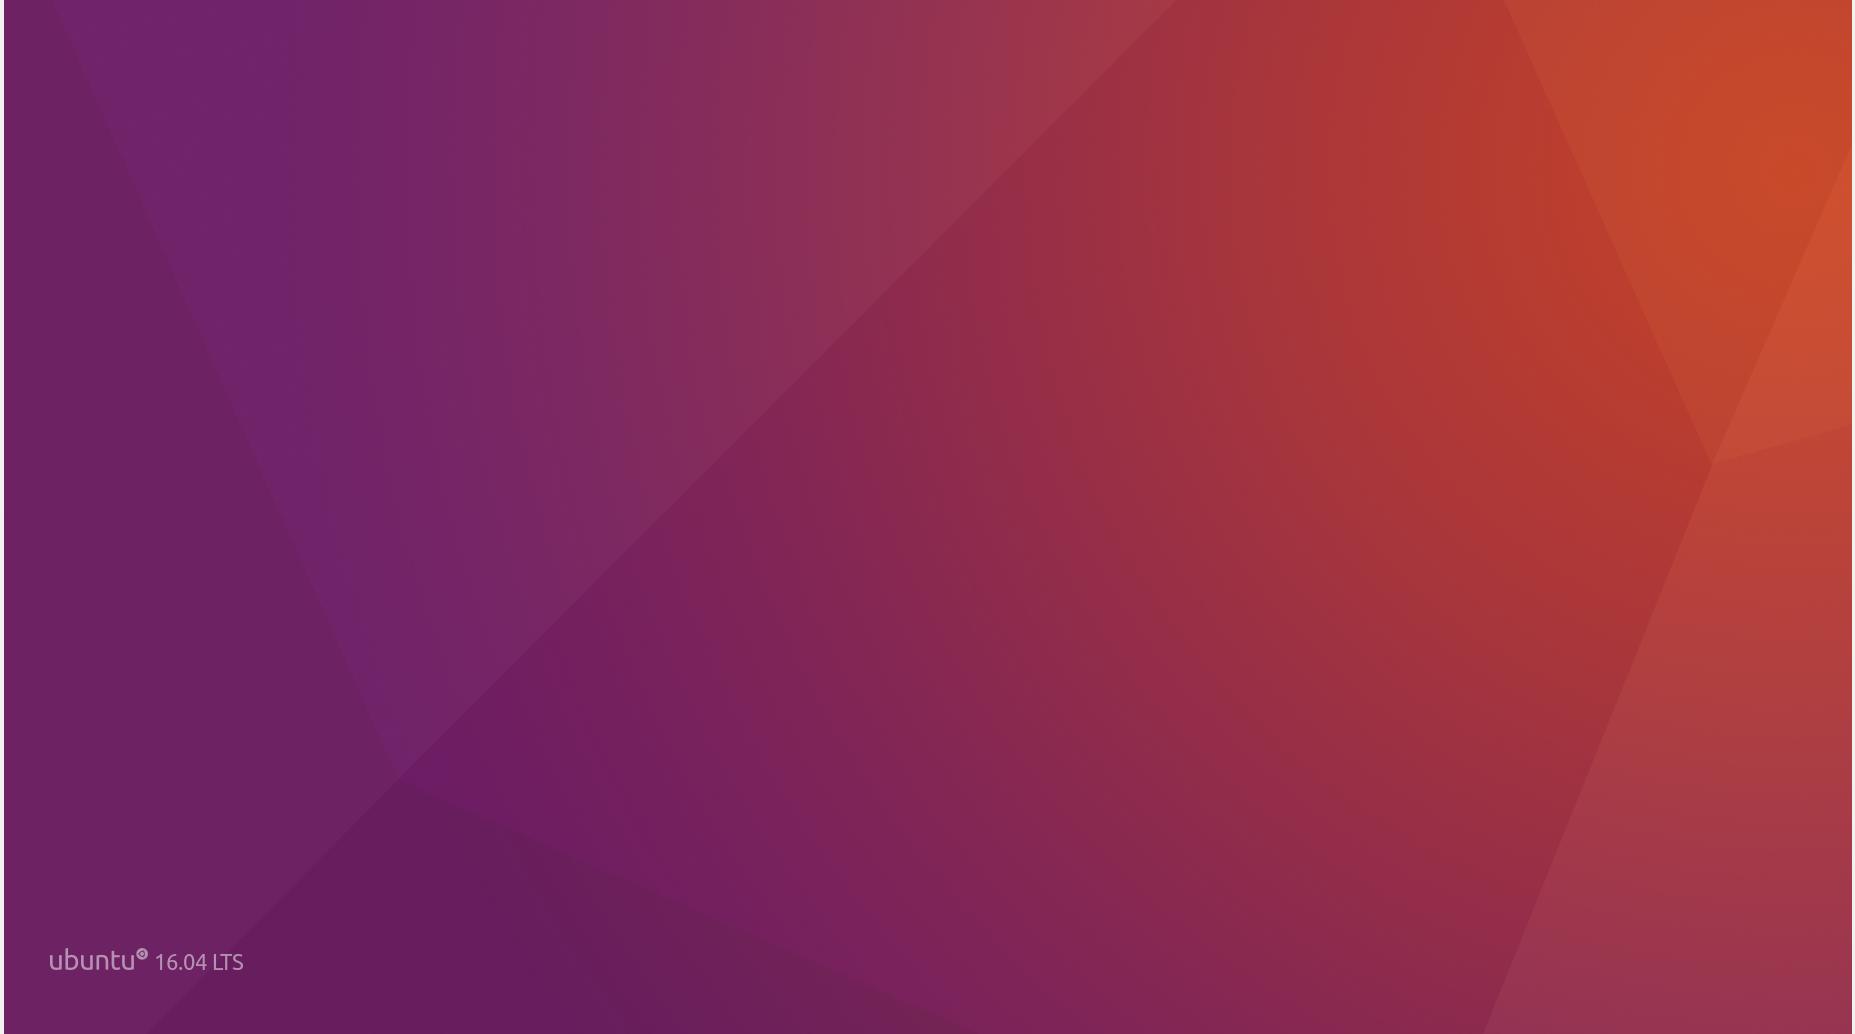 Ubuntu 16.04 LTS Desktop 壁紙